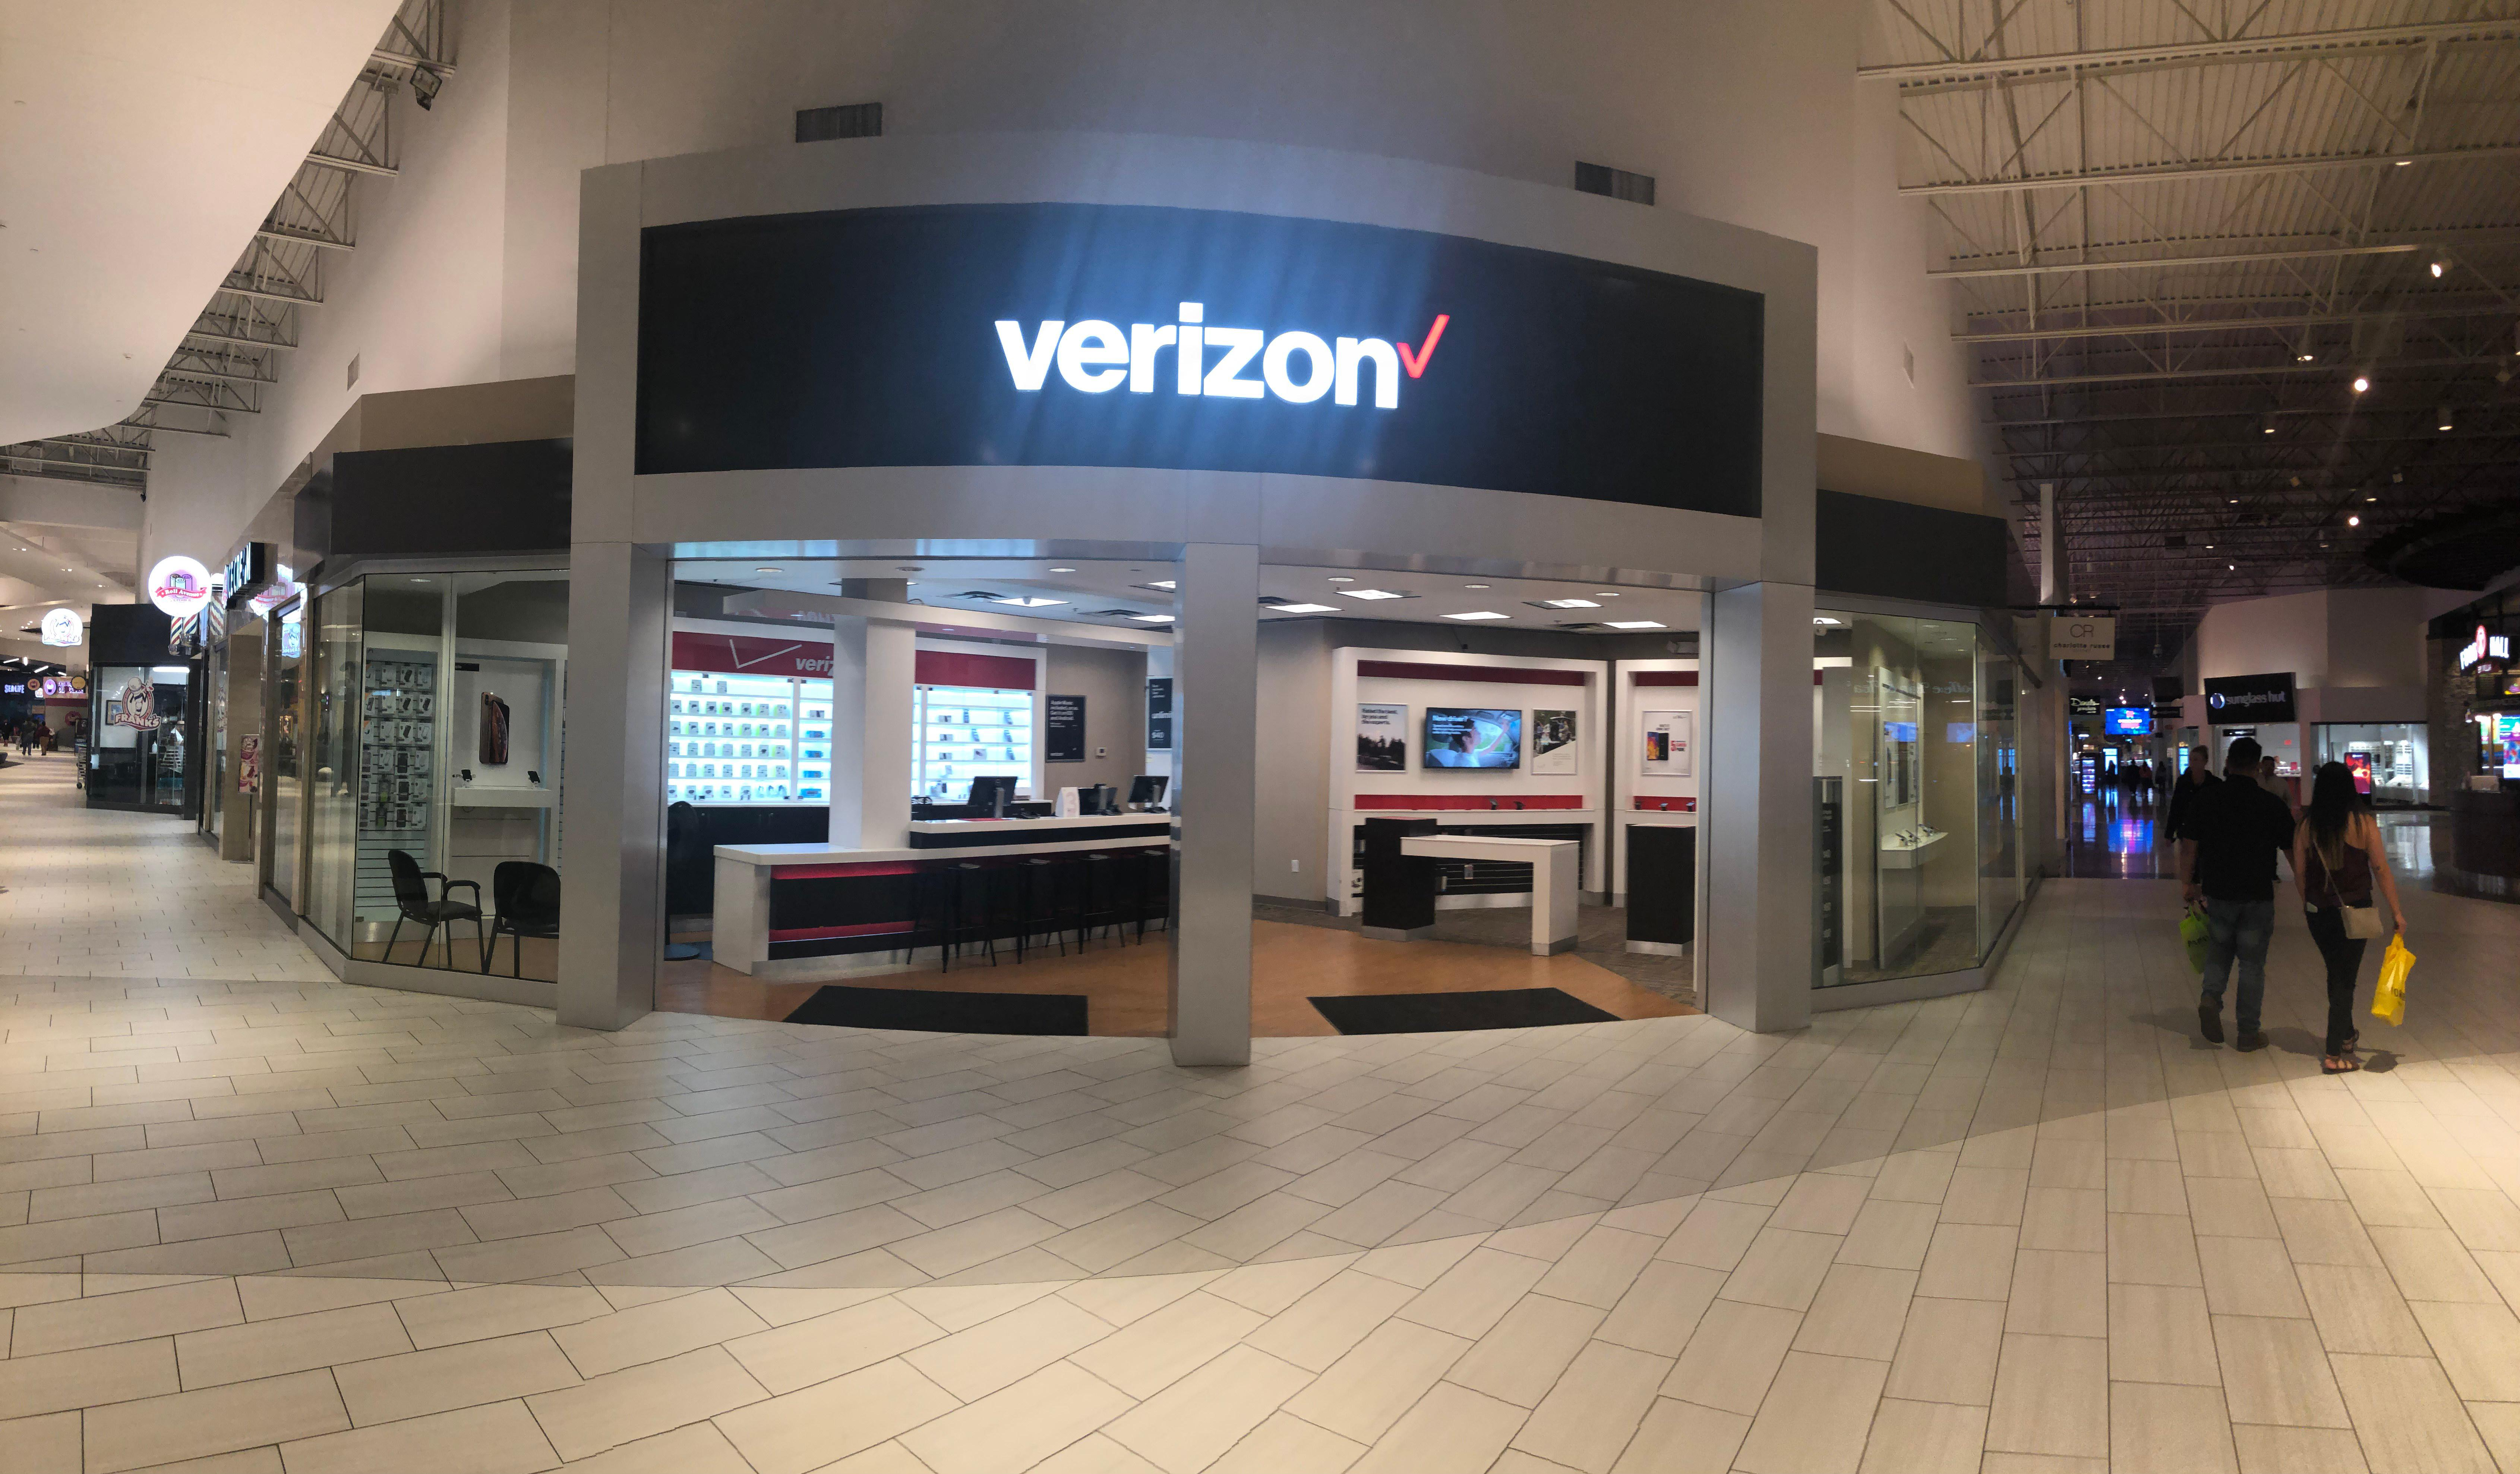 Verizon Authorized Retailer – Victra image 1